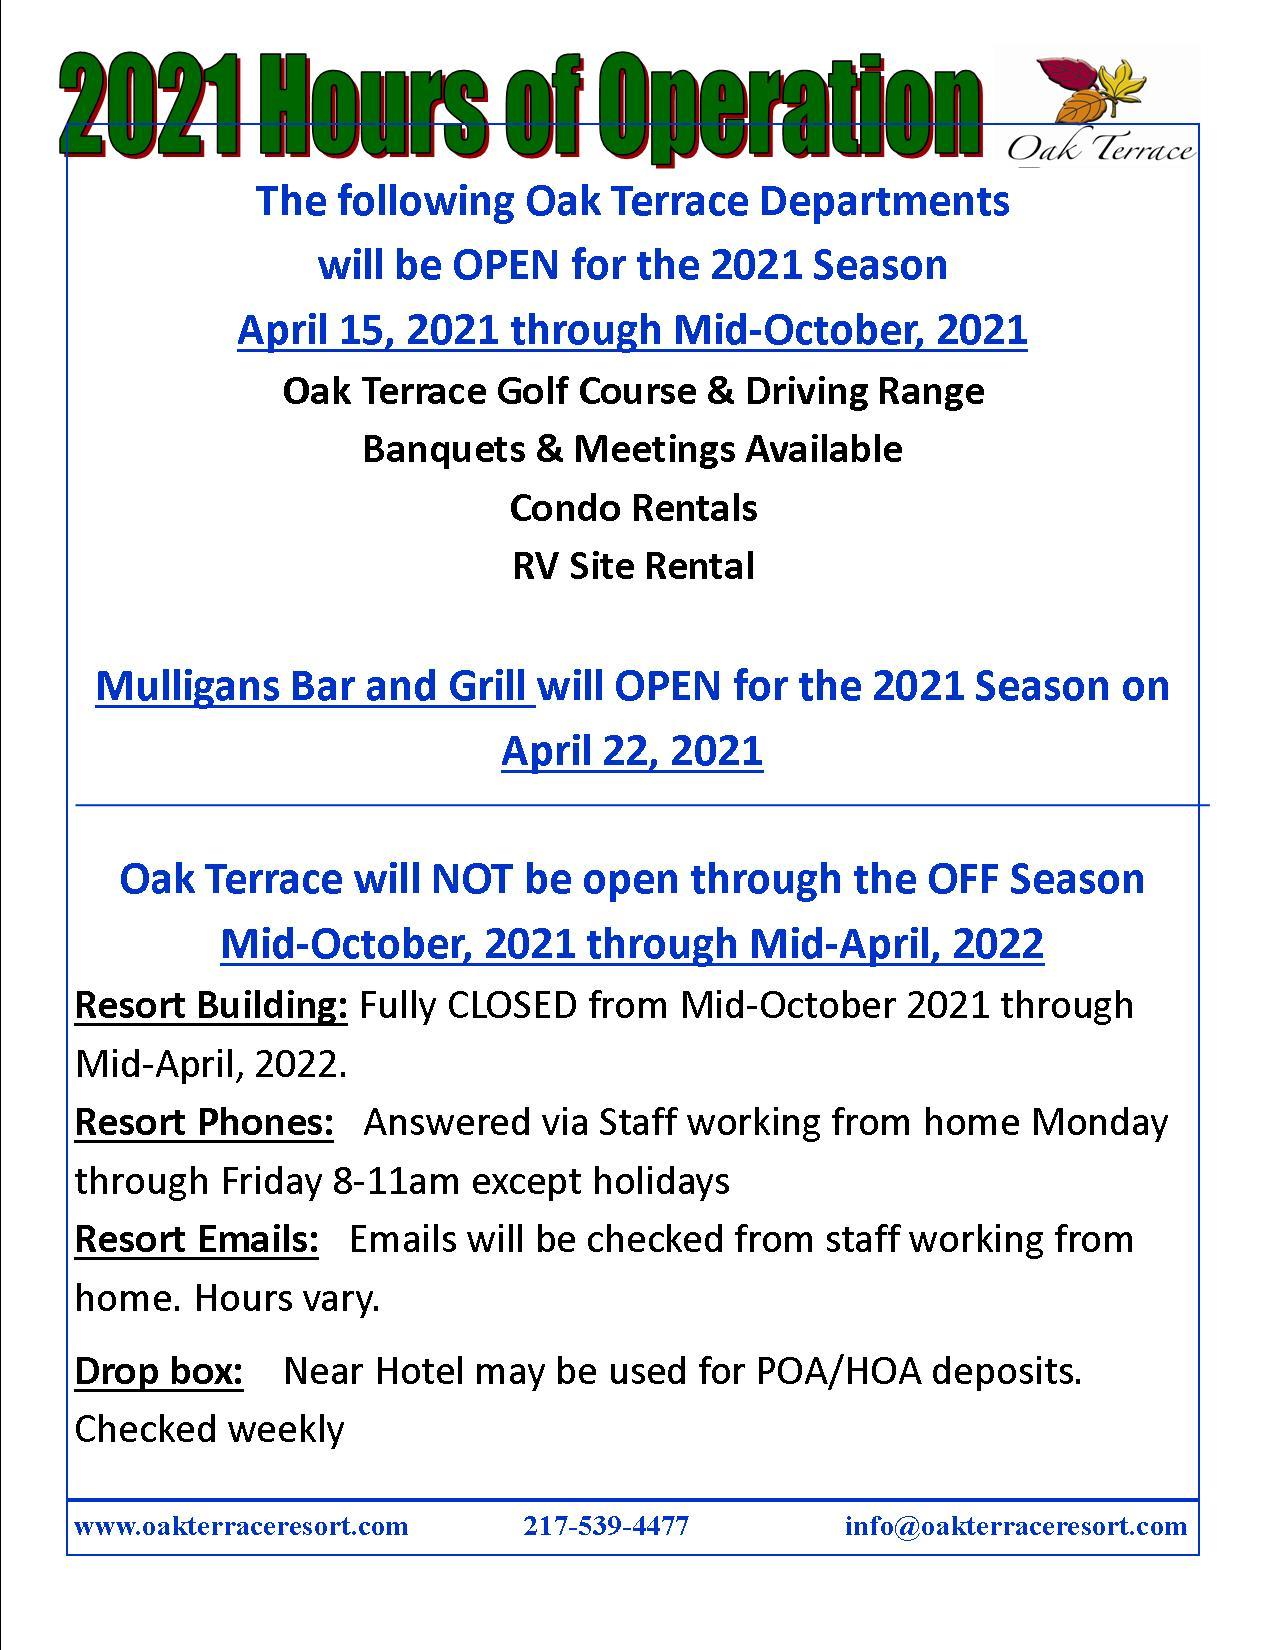 2021 Resort Hours of Operation2